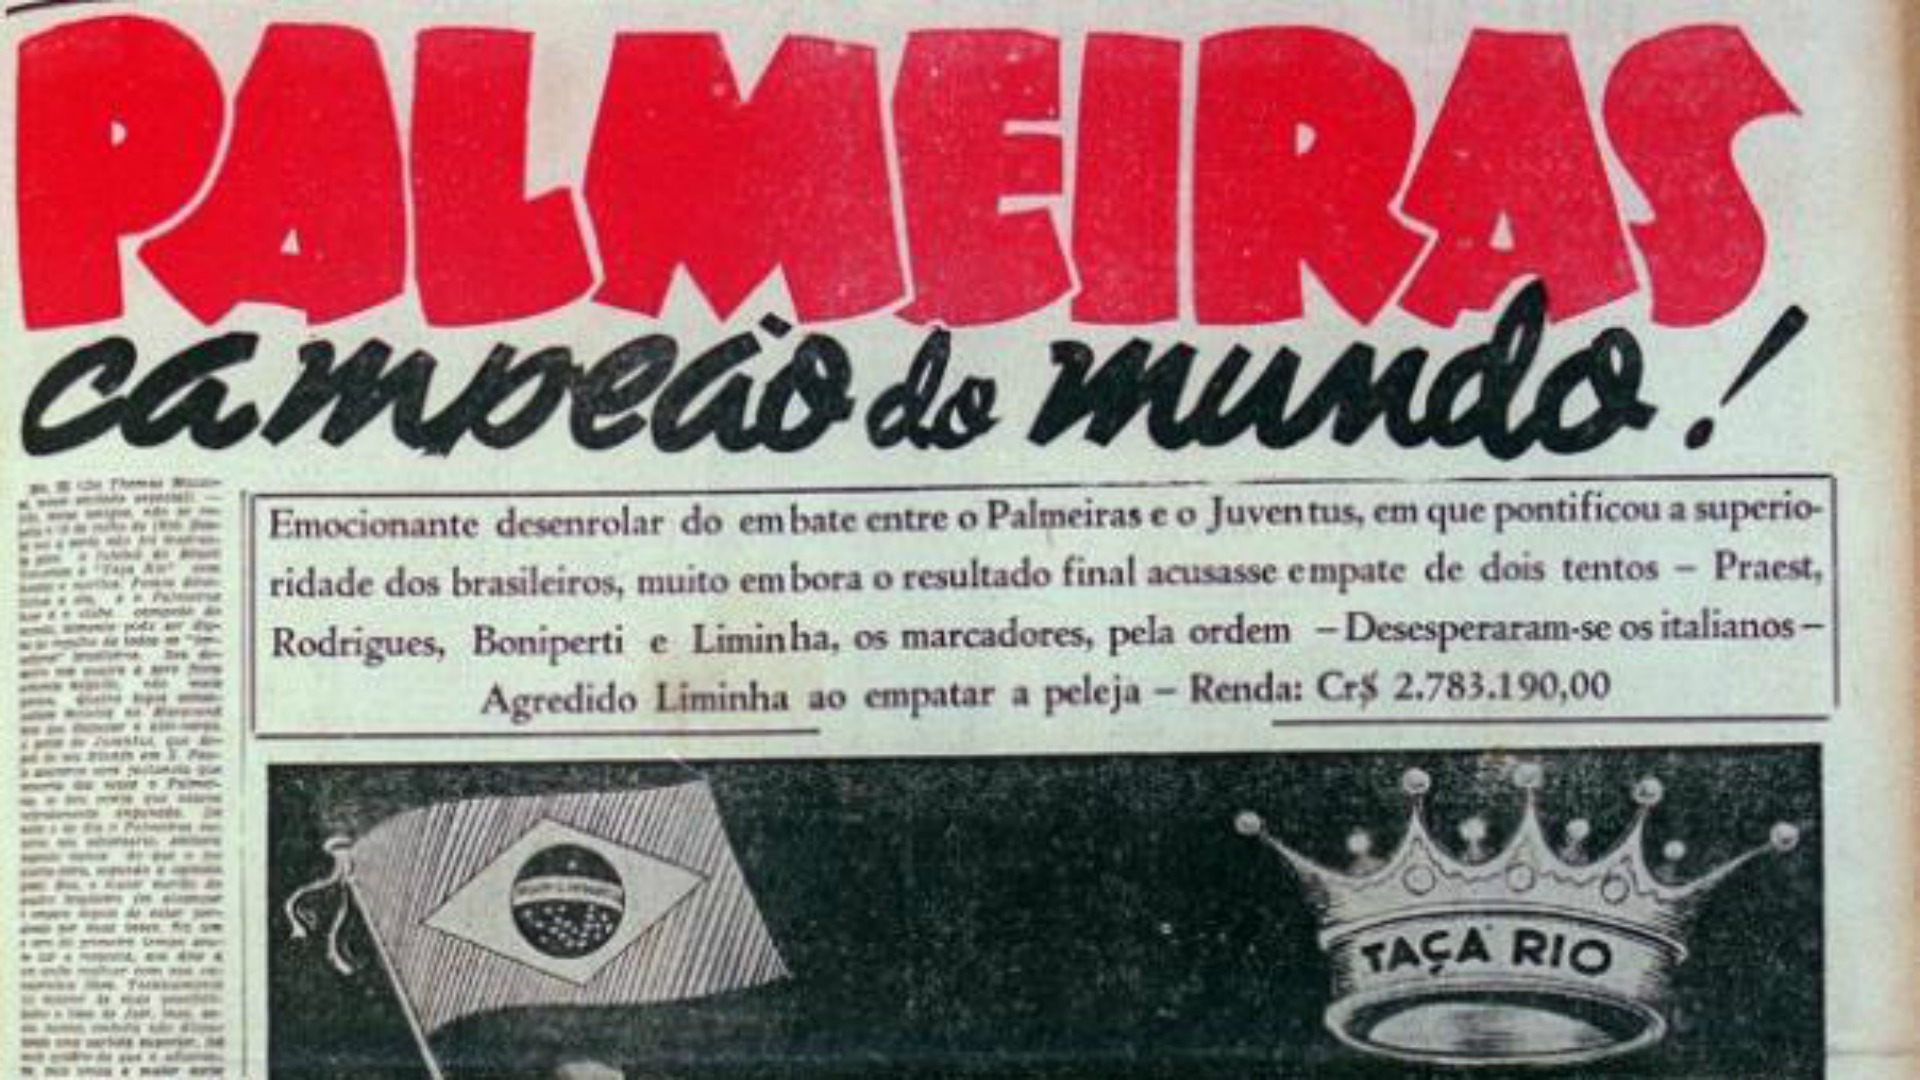 65 anos da Copa Rio de 1951  lembre 14 fatos e curiosidades do Mundial do  Palmeiras  2e2610554aeed